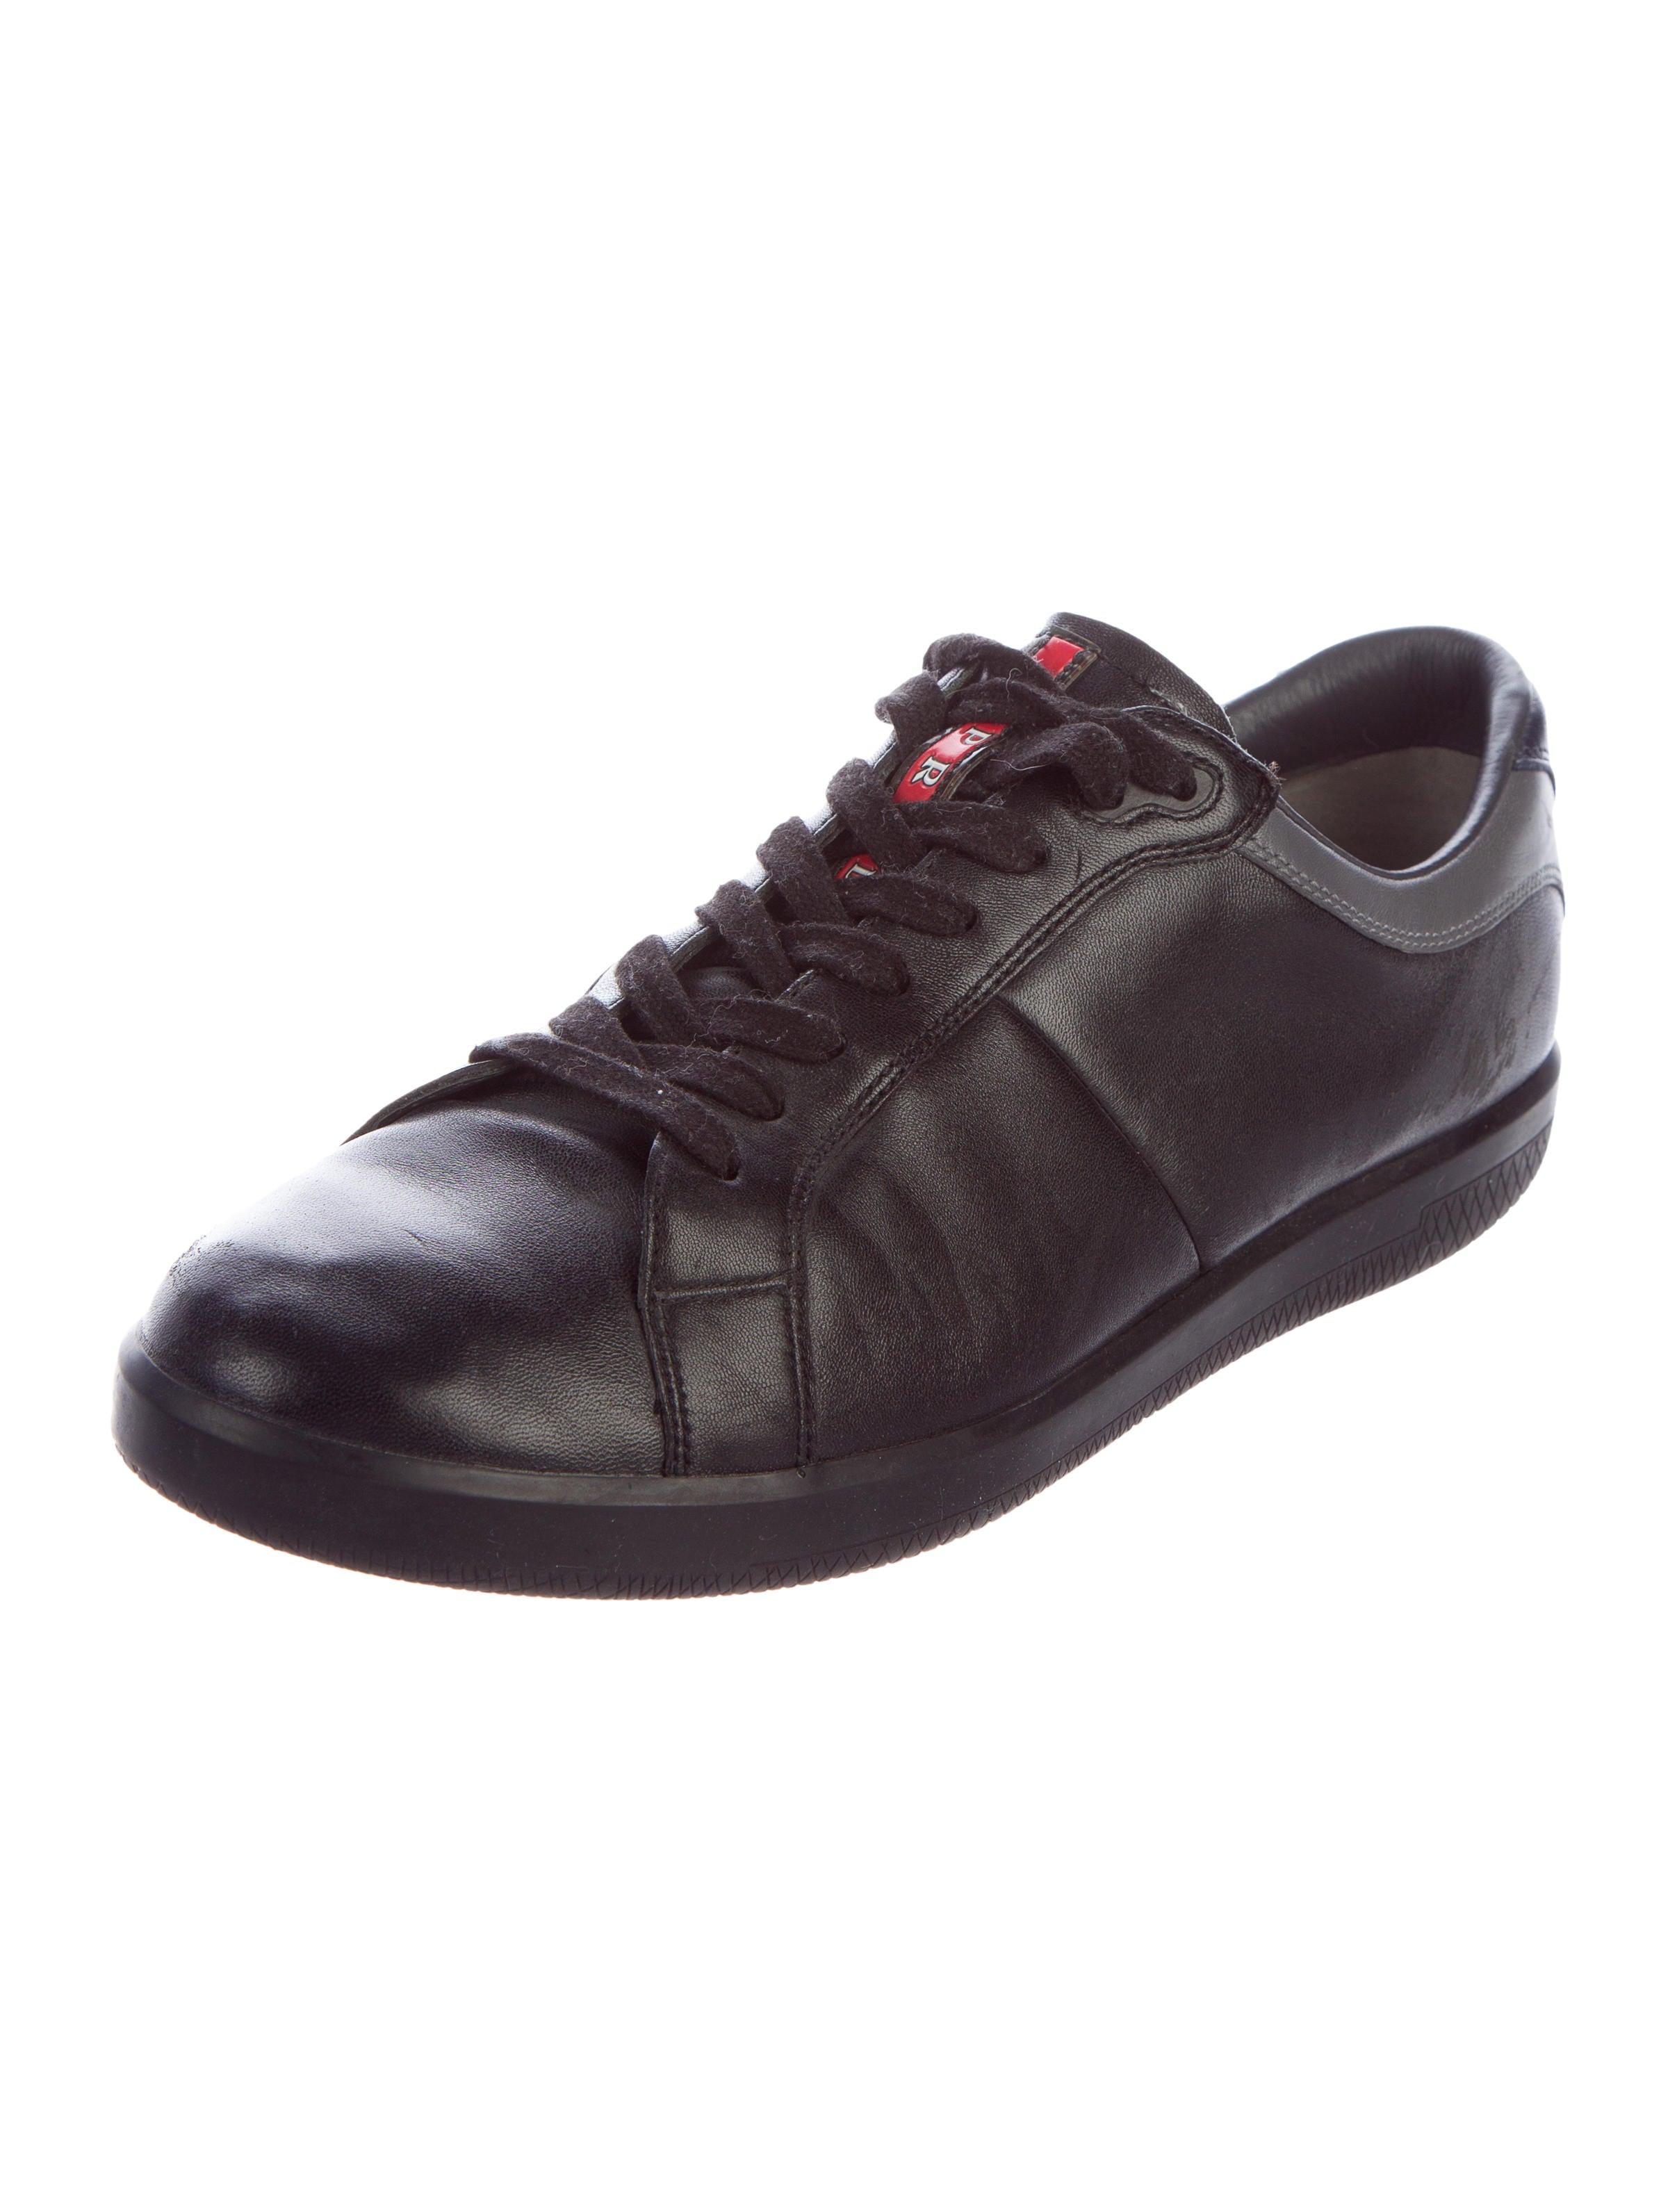 prada sport leather low top sneakers shoes wpr43982